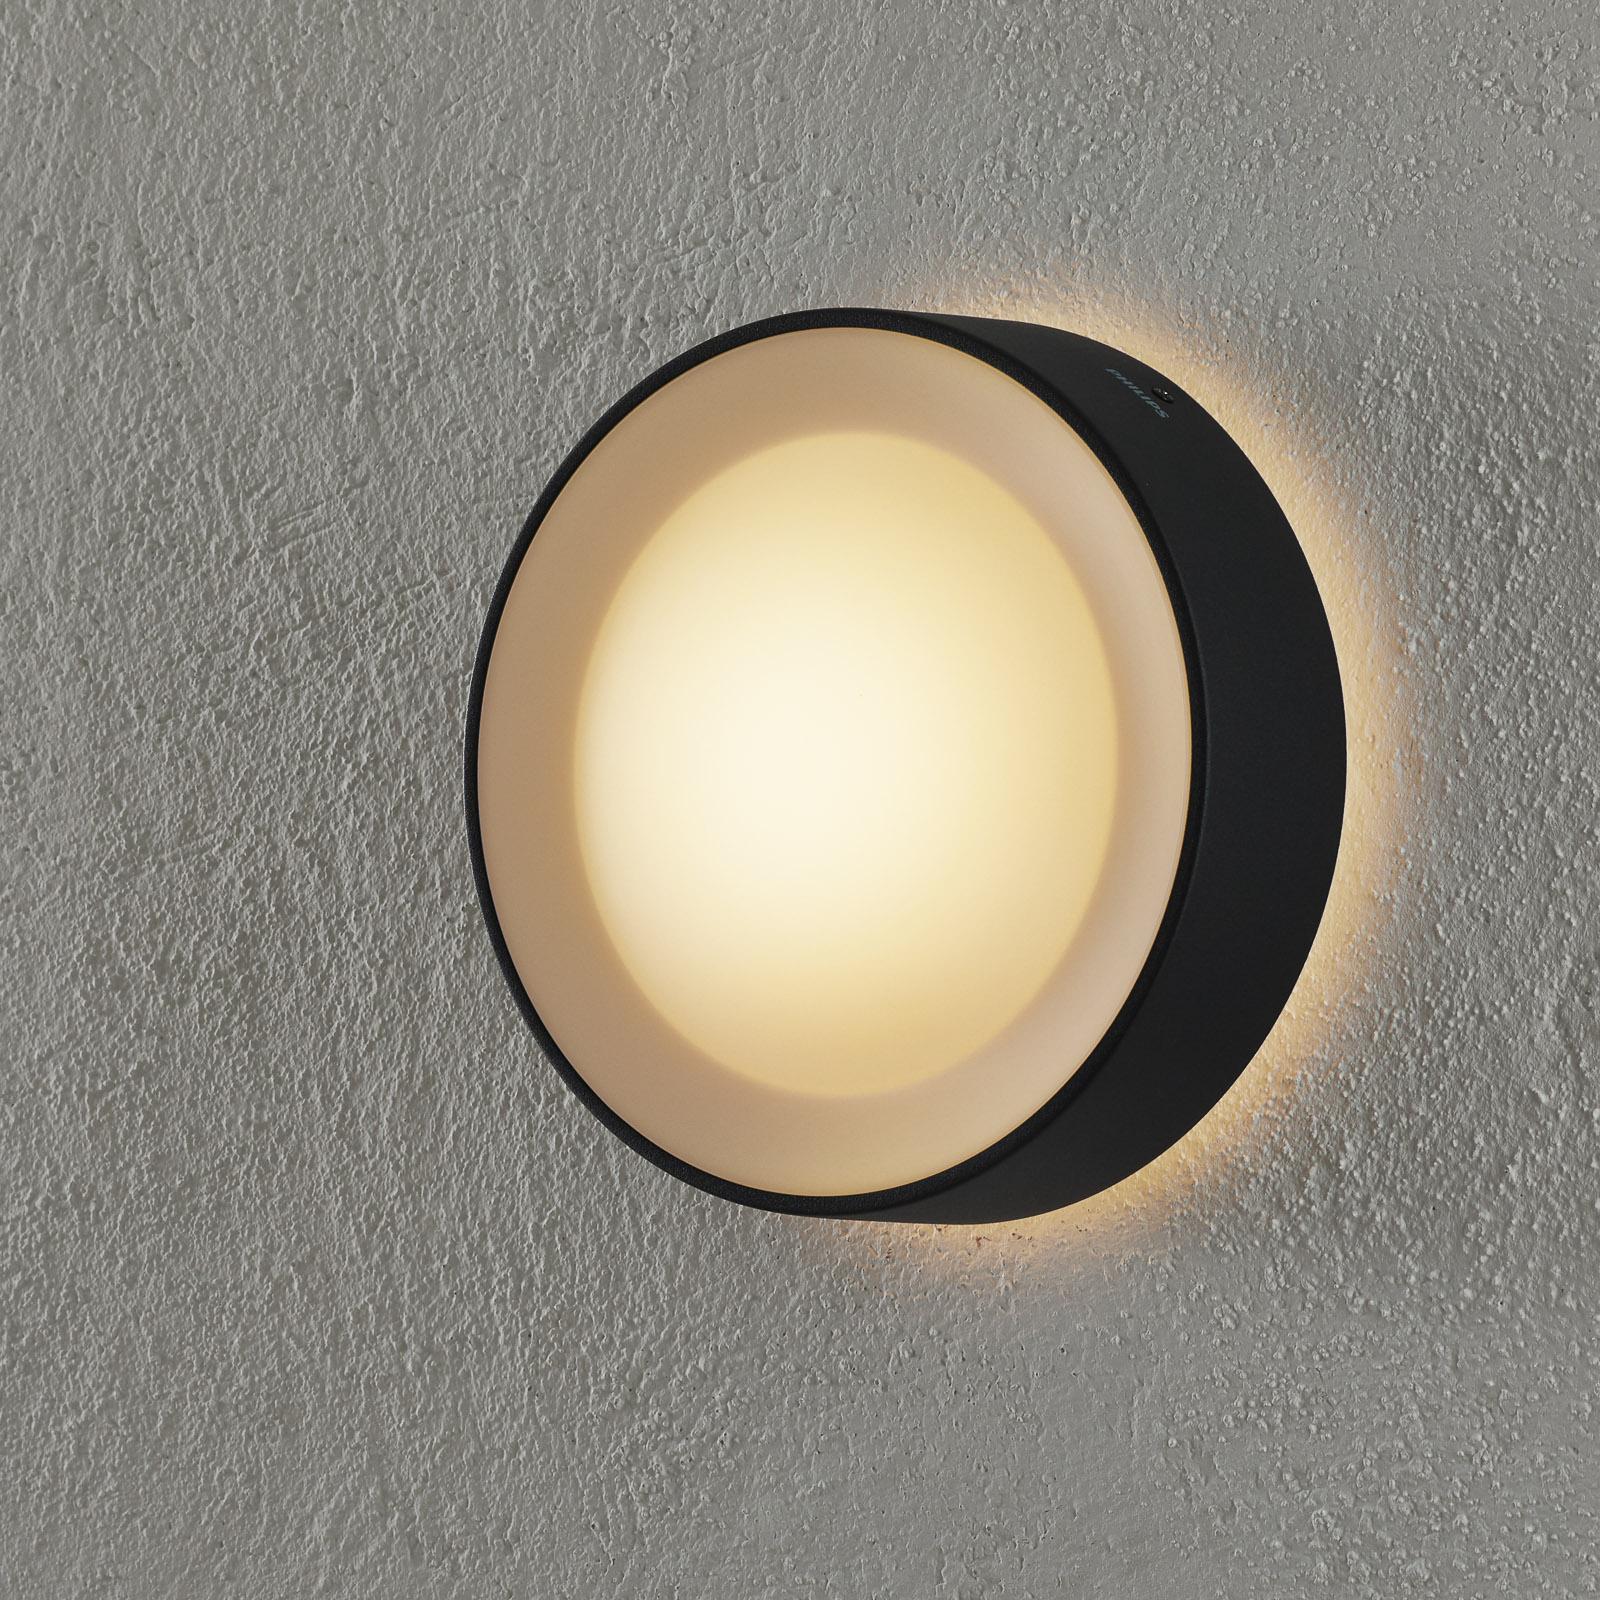 Philips Hue WACA Daylo outdoor wall light black_7534181_1